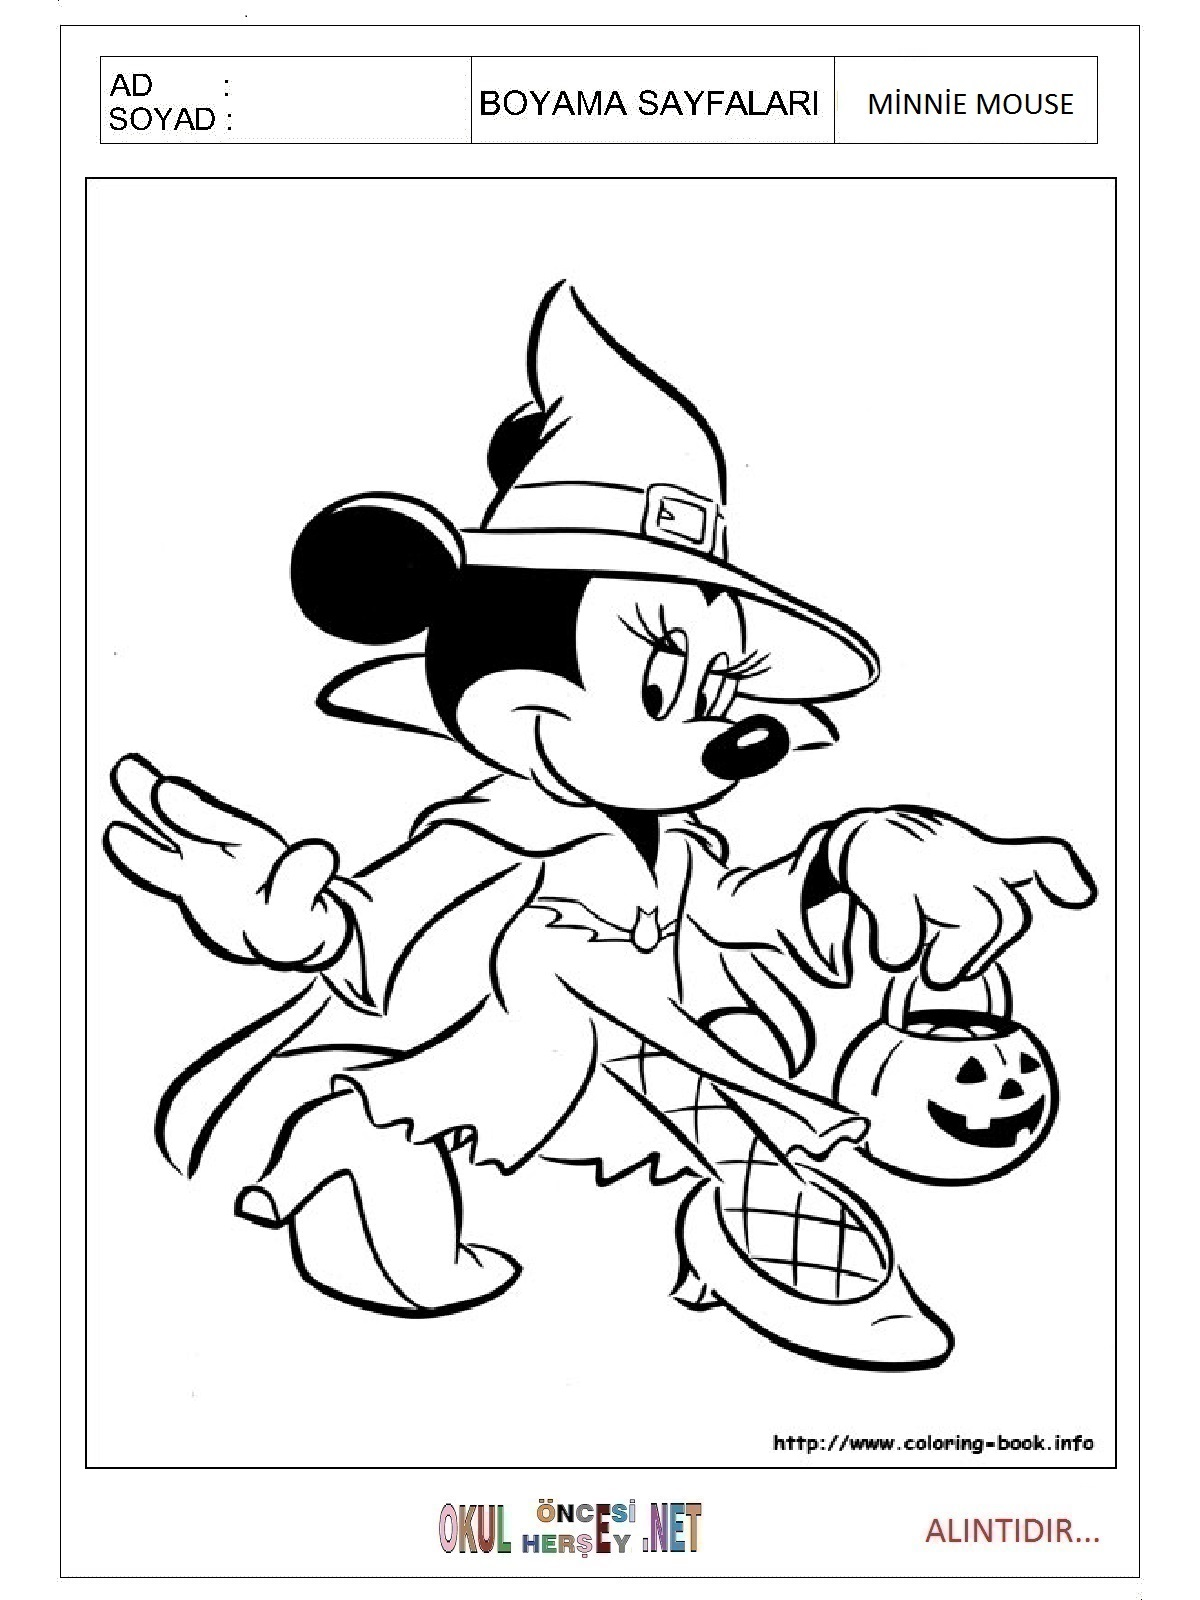 Minnie Mouse Boyama Sayfalari